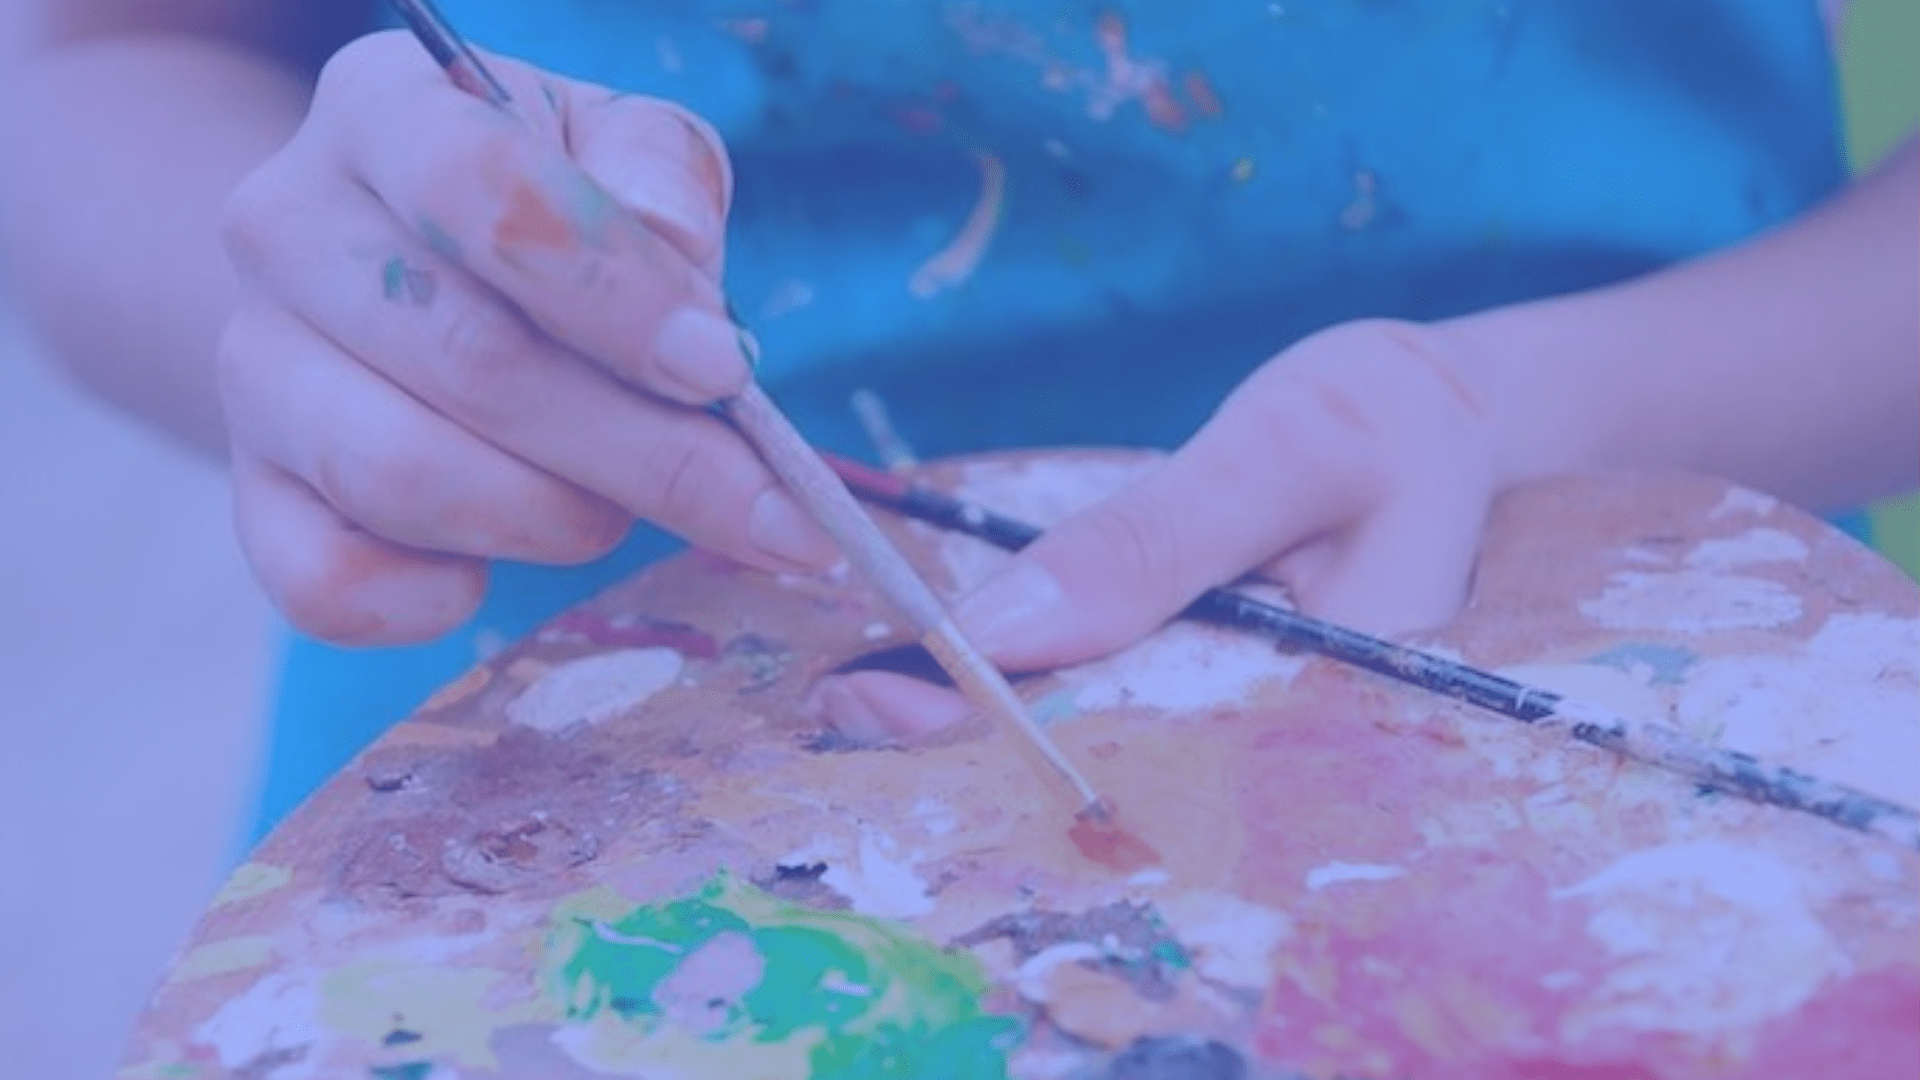 Children Summer Course - Art Classes Malta